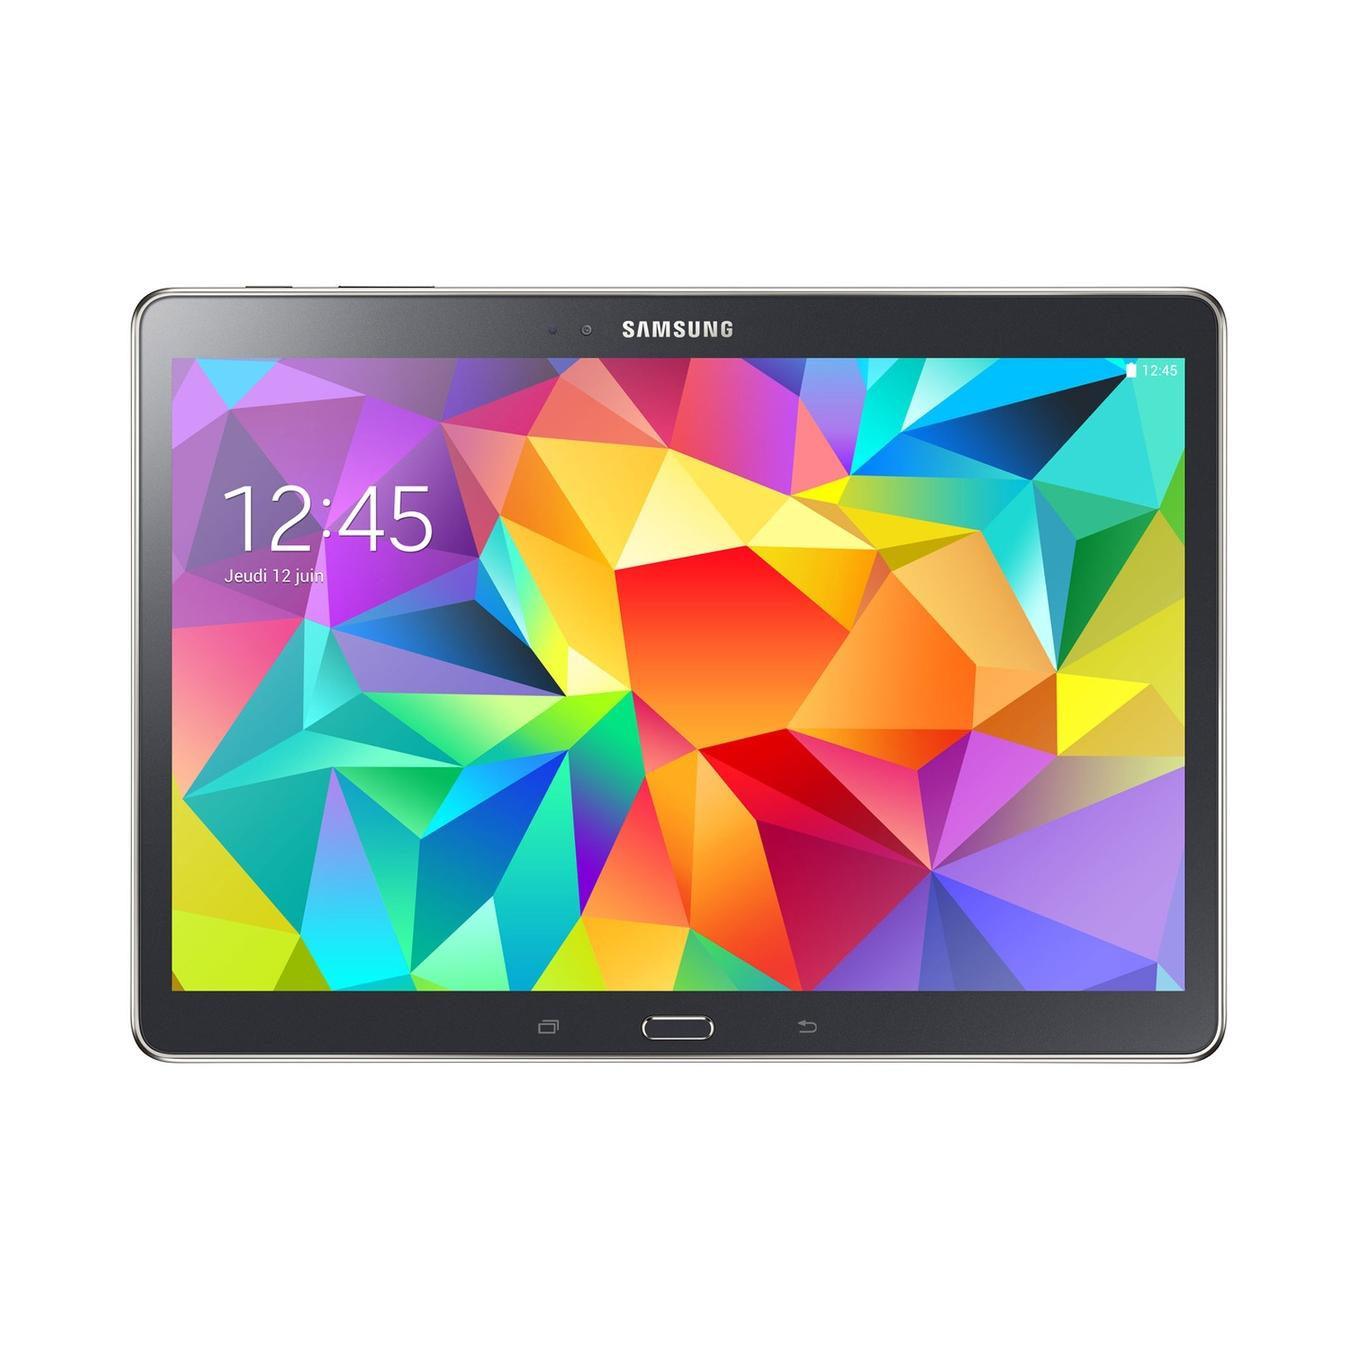 Samsung Galaxy Tab S 10.5 16 GB Gris